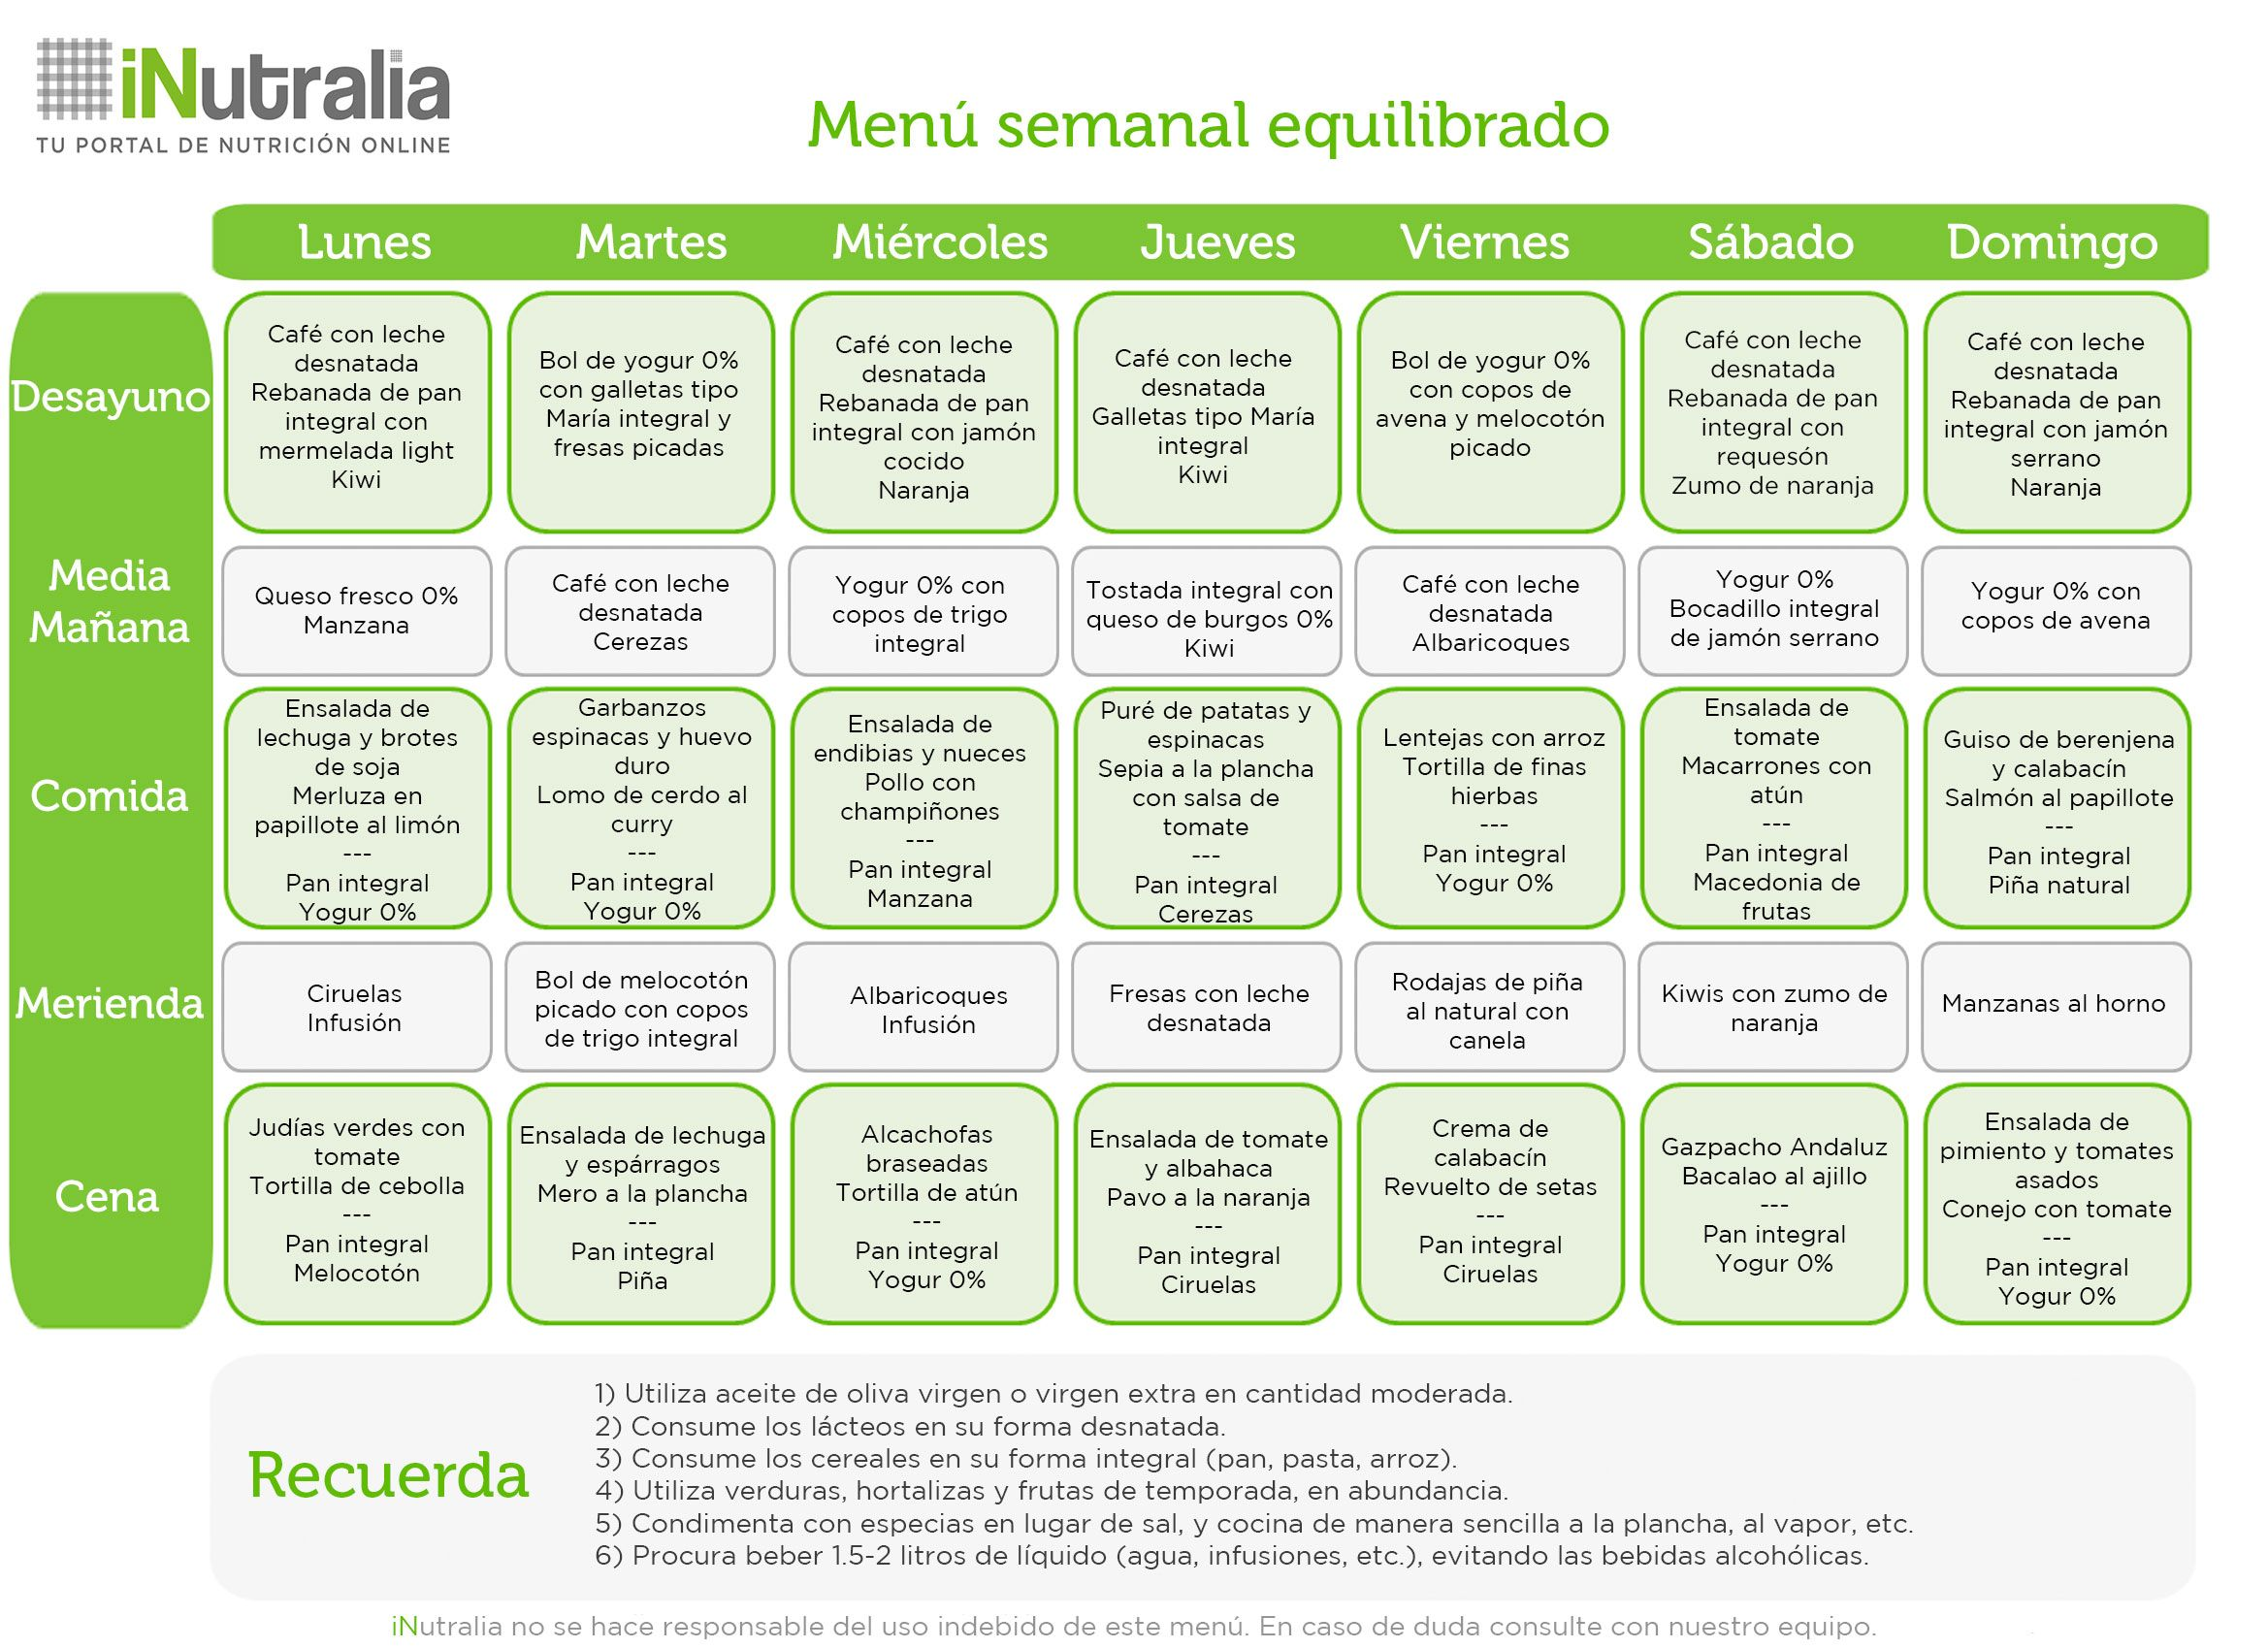 menu semanal equilibrado 2338 1700 recetas